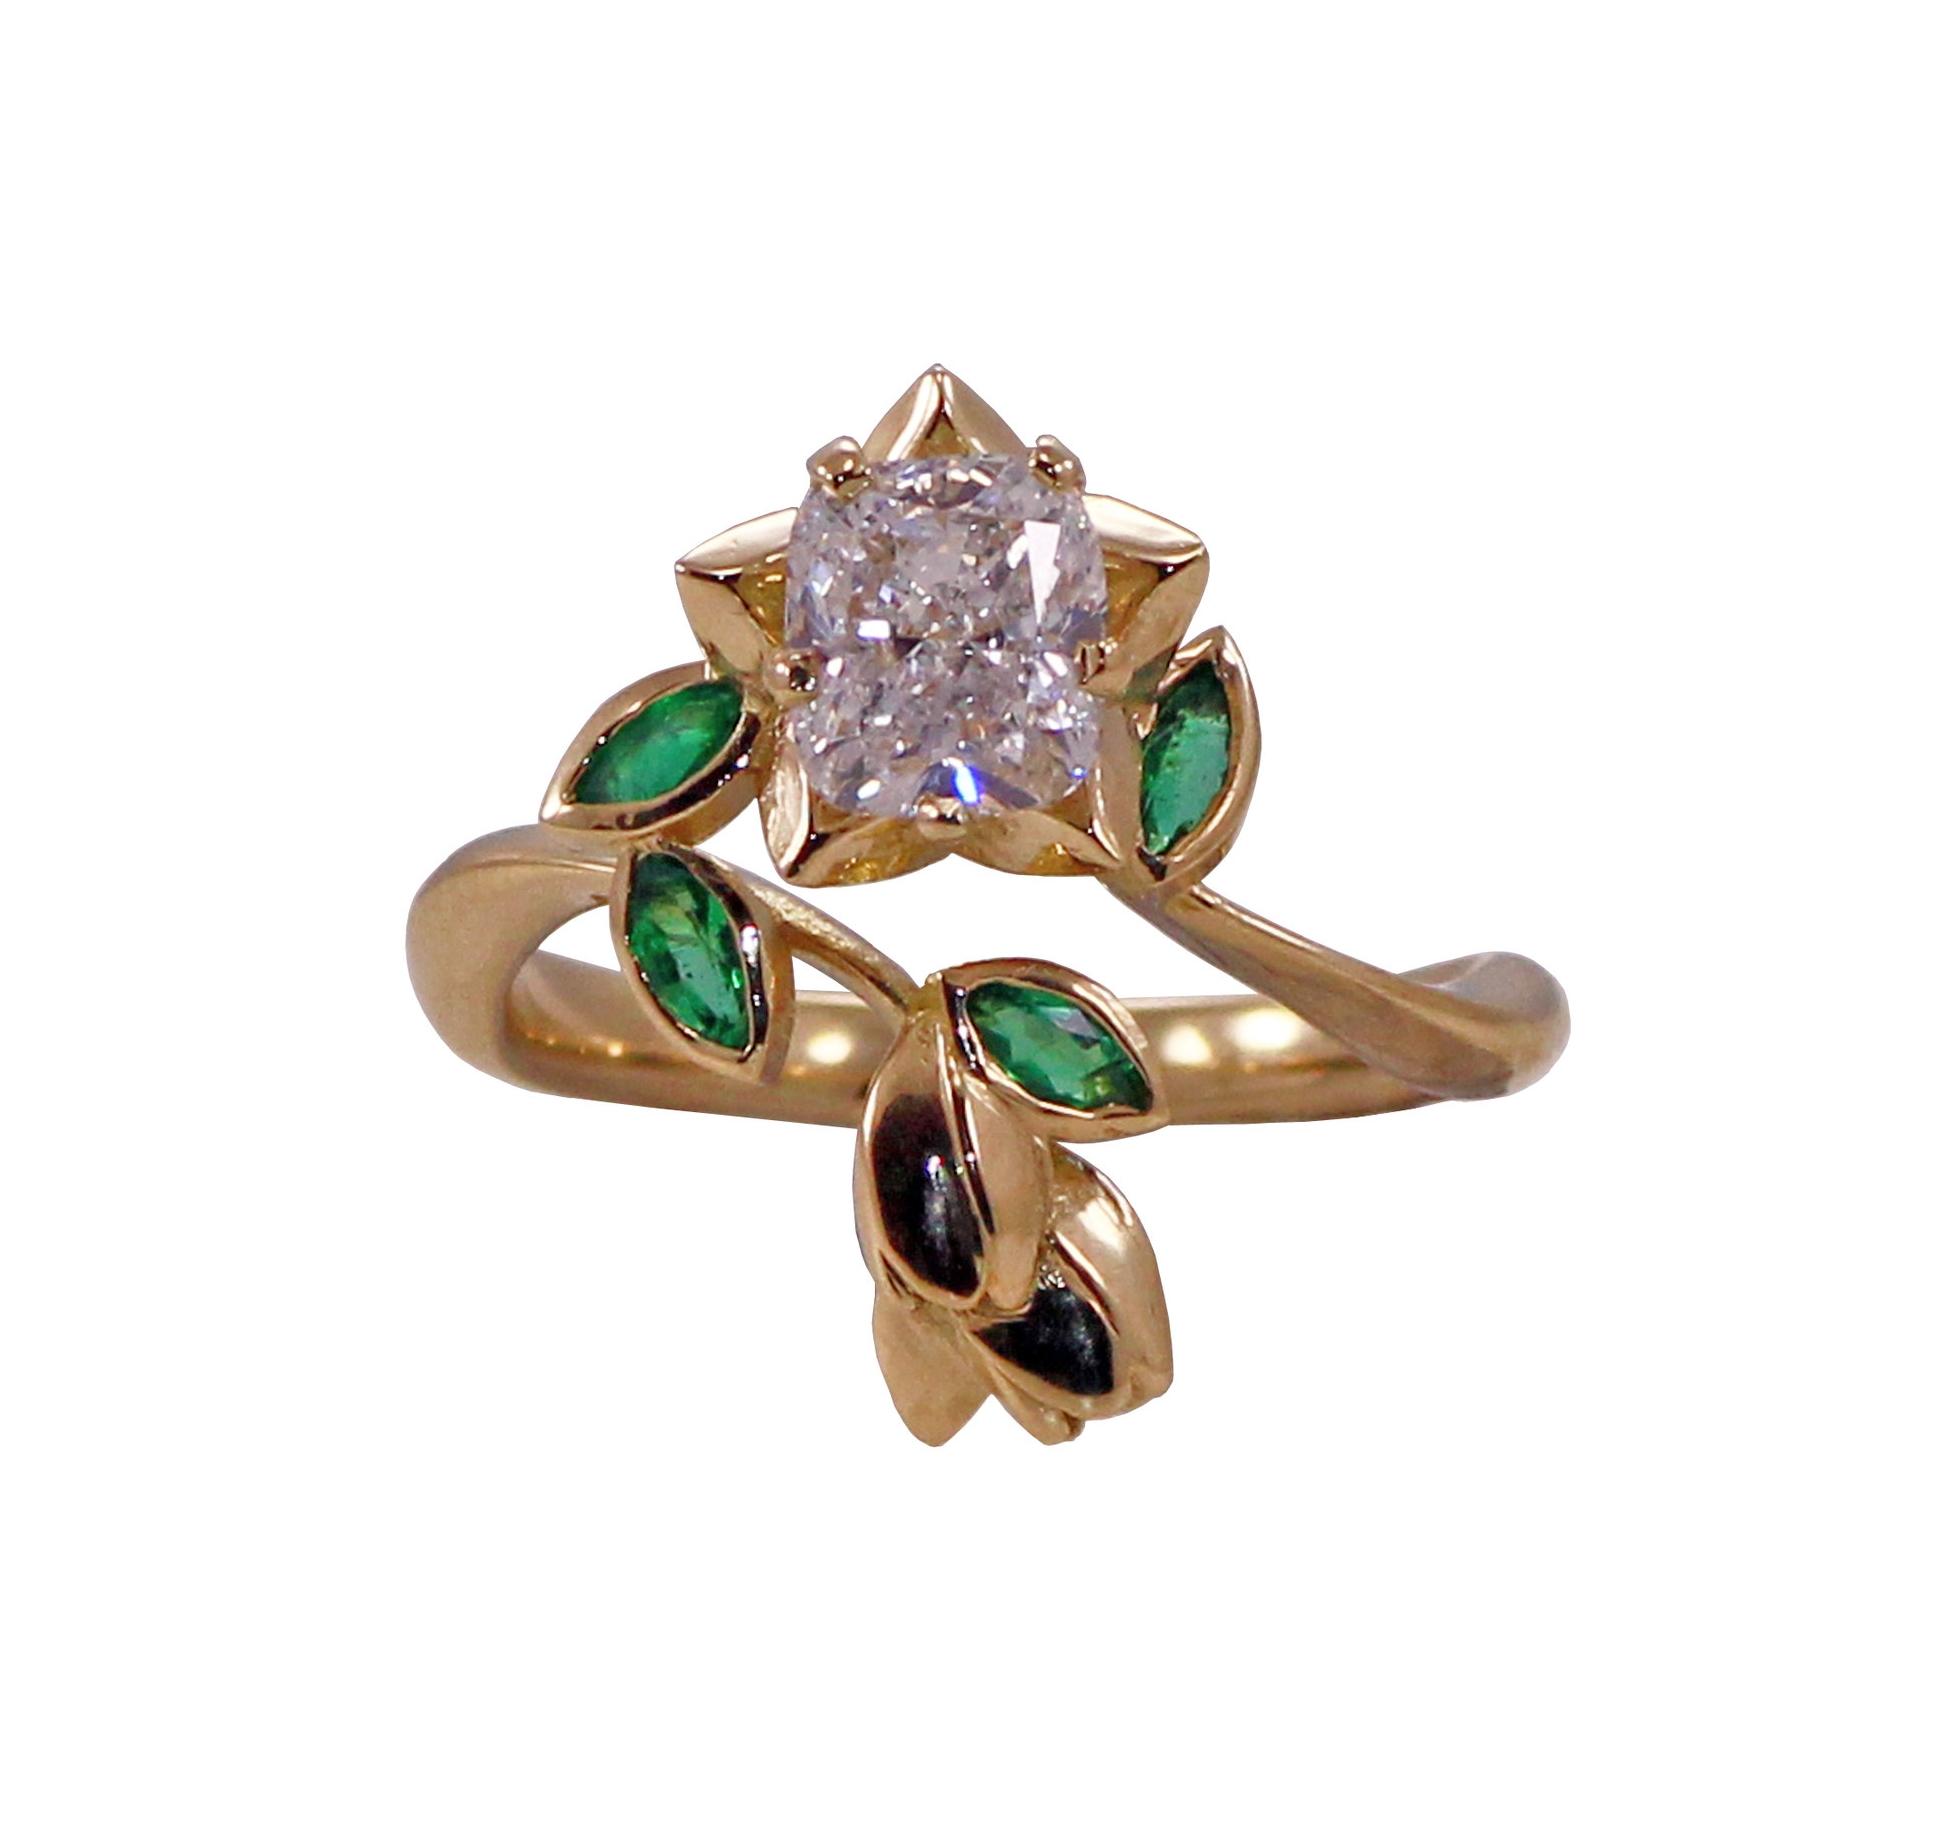 Bespoke Cushion Cut Diamond & Emerald Ring